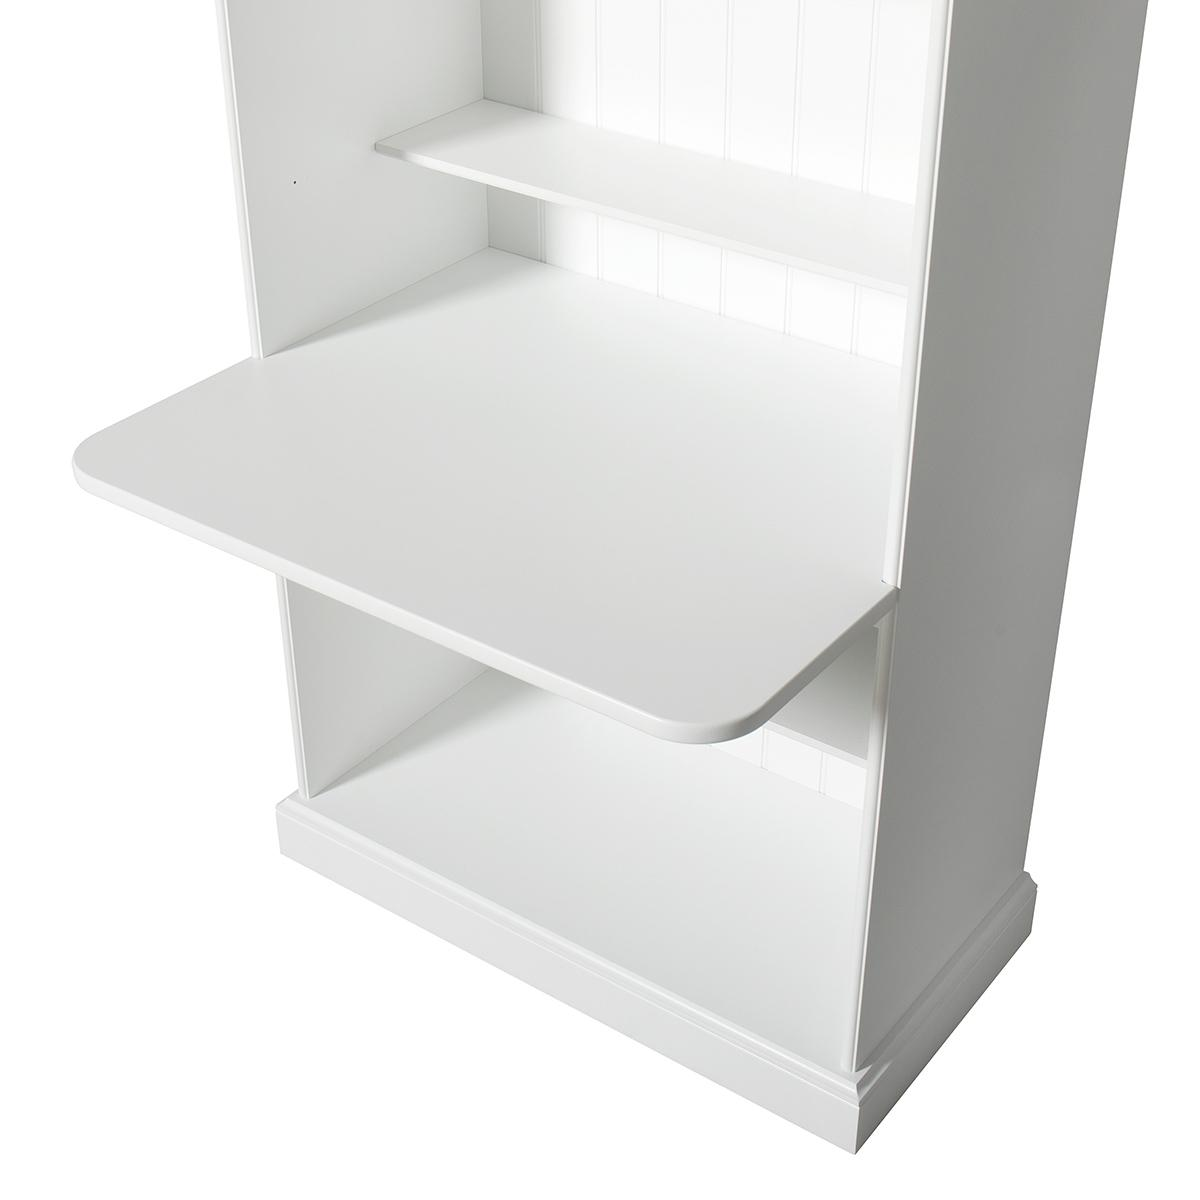 Hohes Regal SEASIDE Oliver Furniture weiß